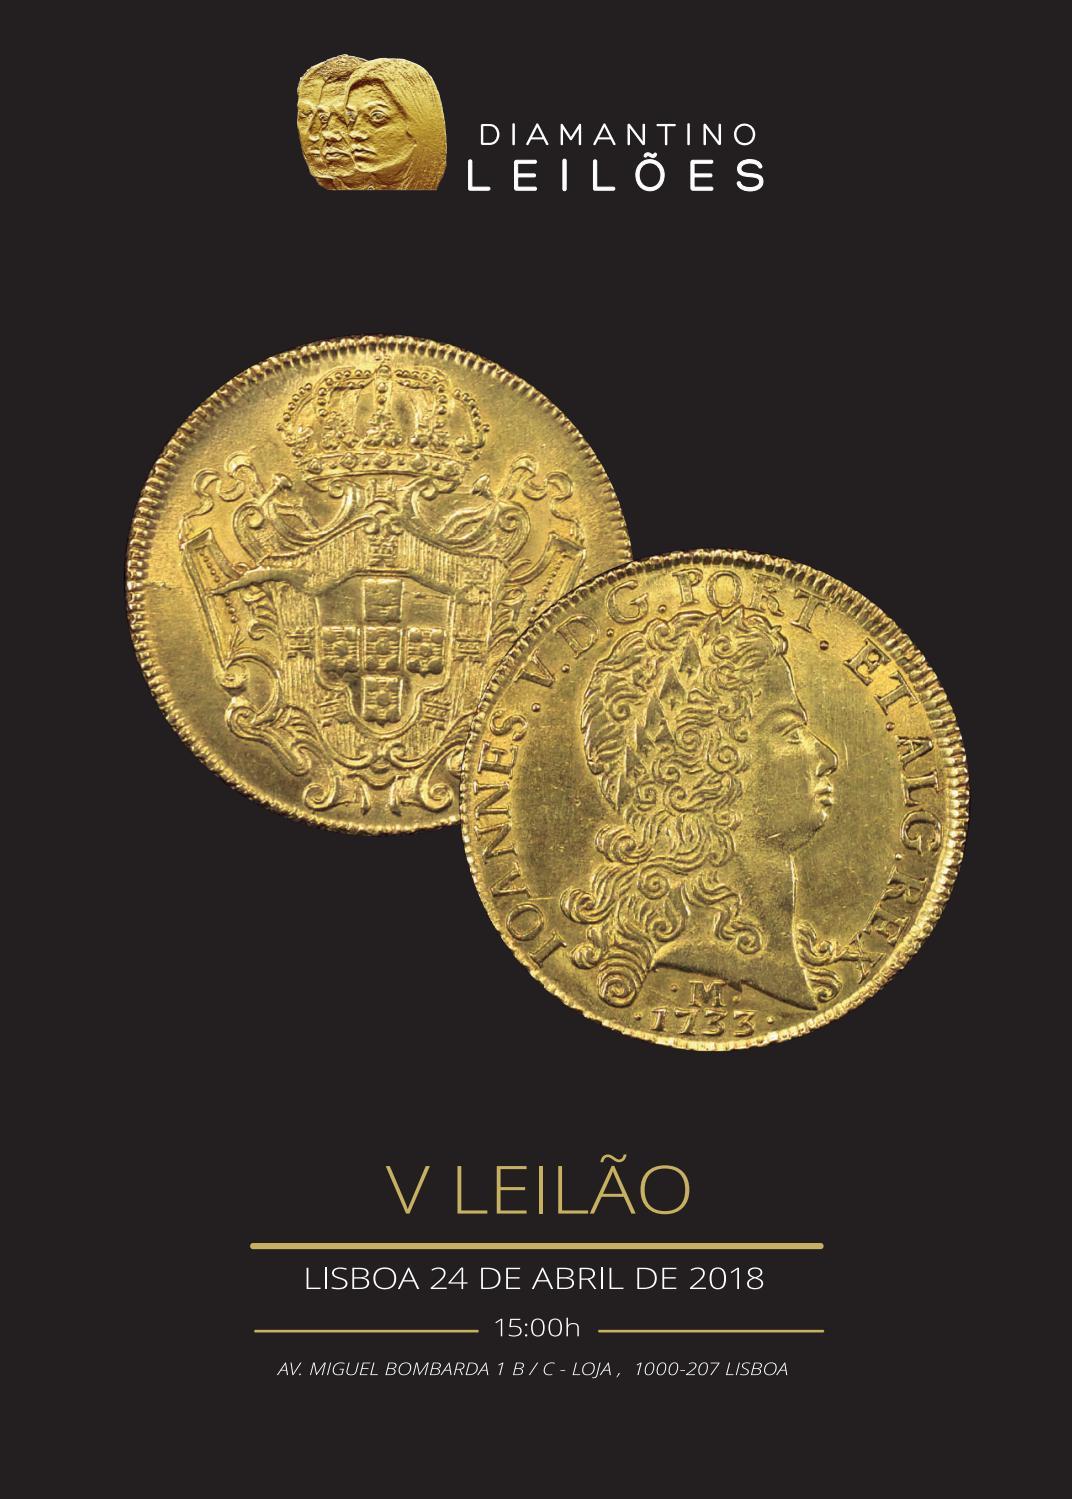 50 Escudos 10-06-1973 PIC-105  Luis Camões   UNCIRCULATED ANGOLA PORTUGAL